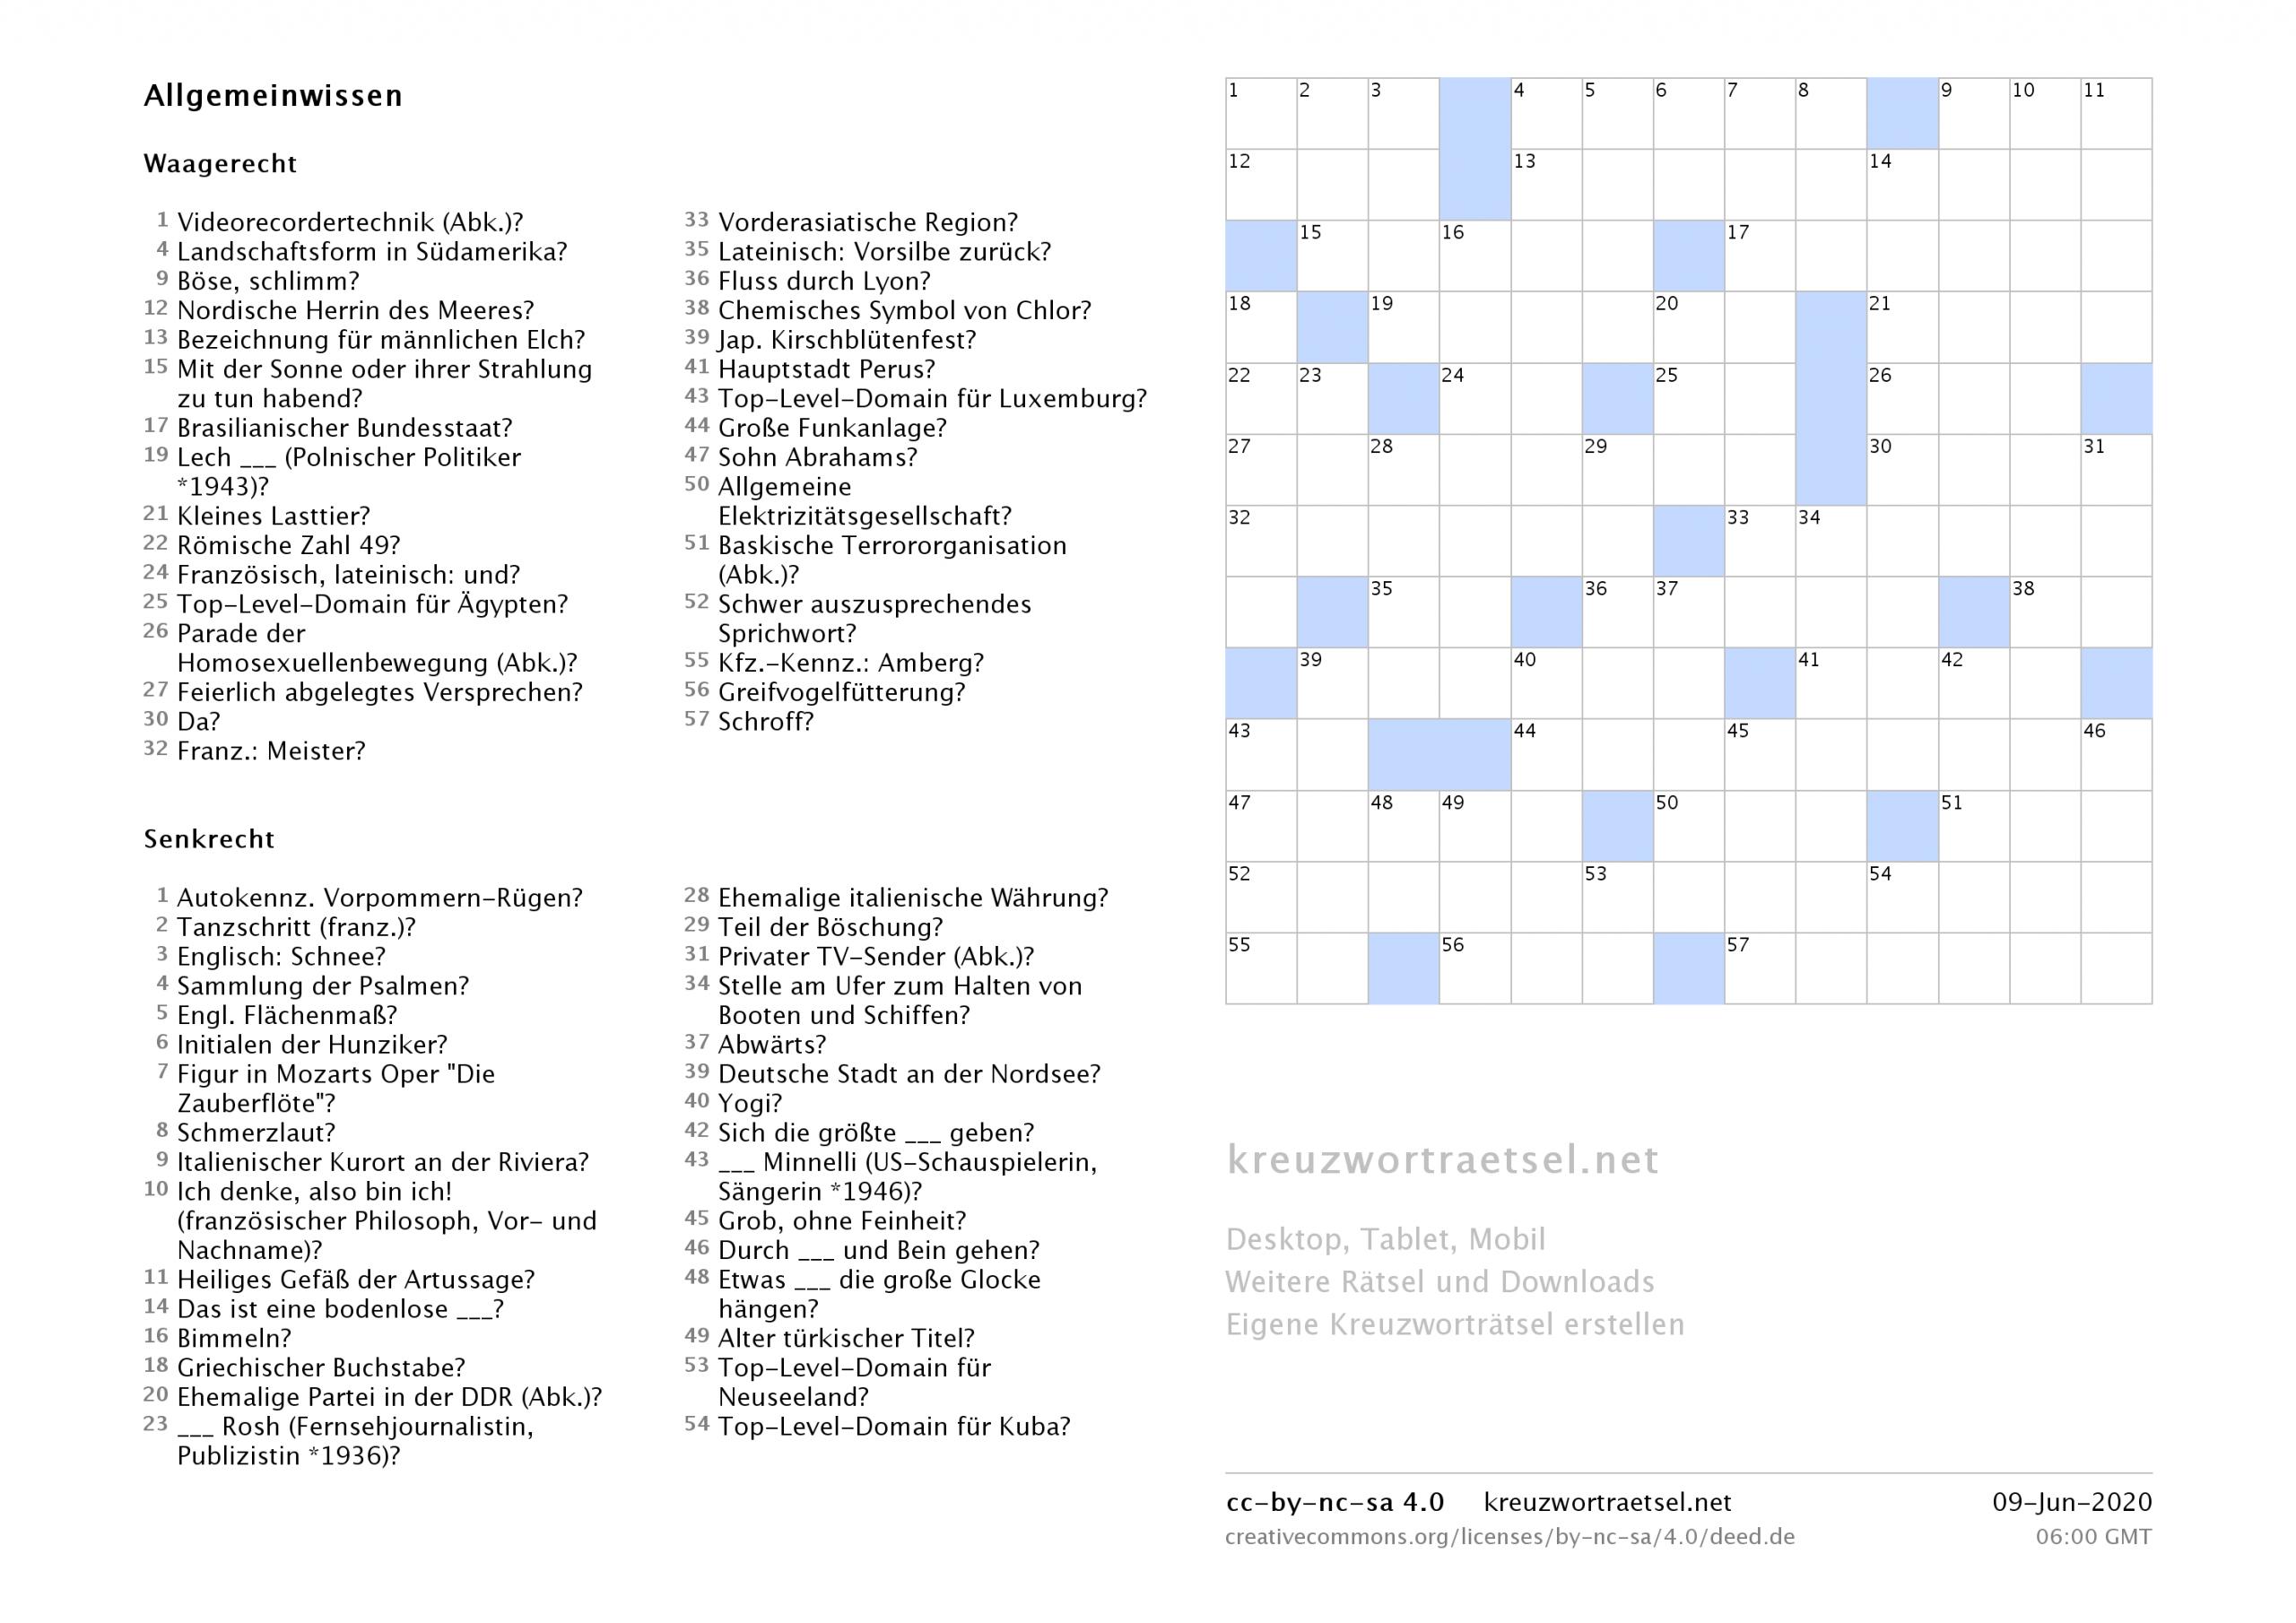 Kreuzworträtsel Zum Ausdrucken  Kreuzworträtsel für Rätsel Zum Ausdrucken Für Erwachsene